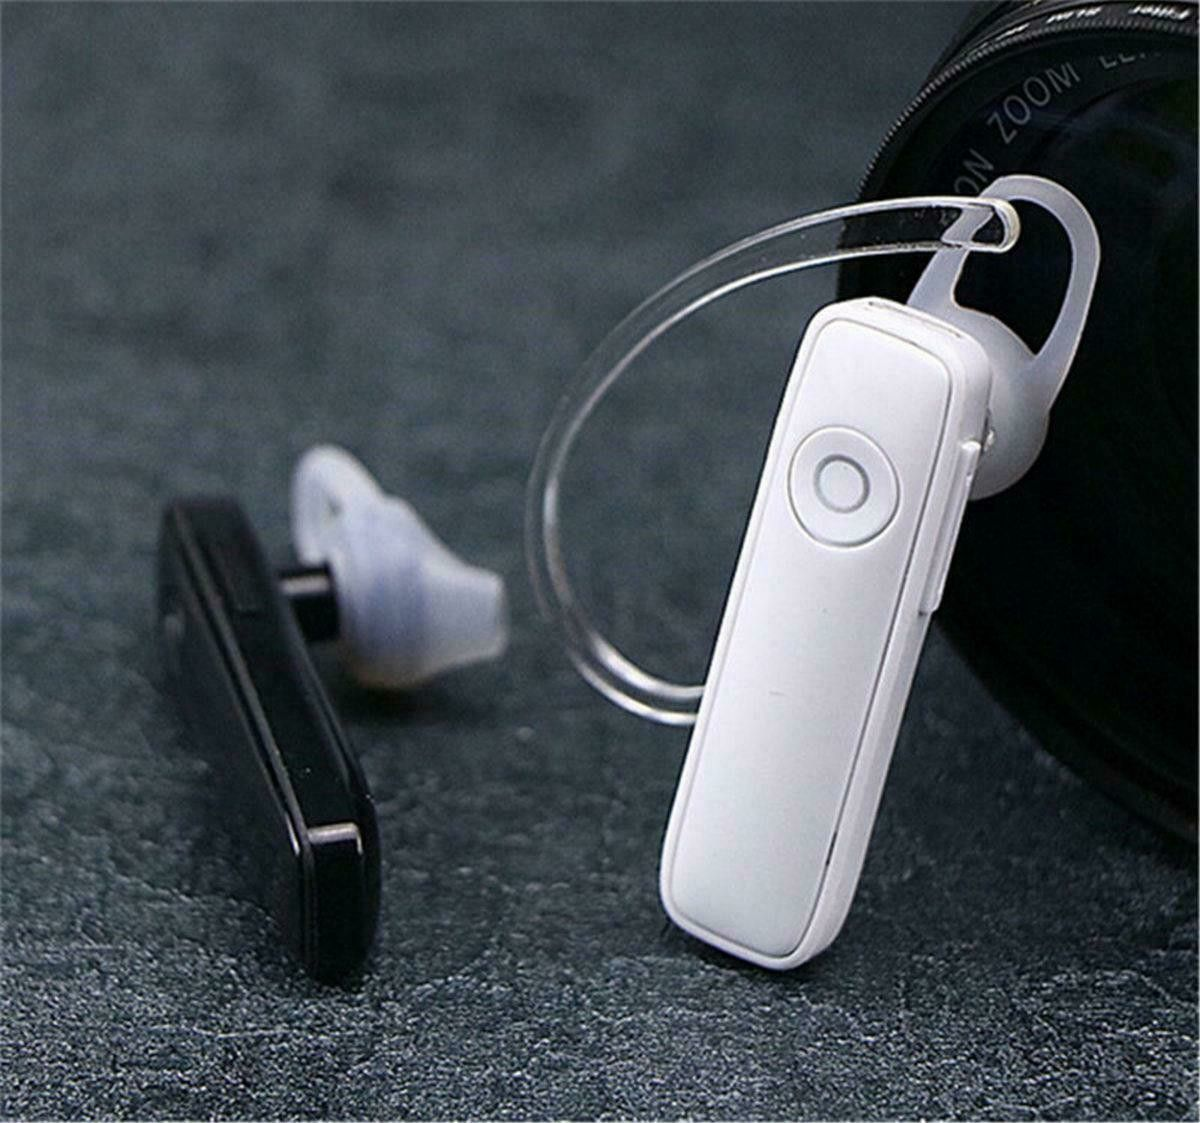 Bluetooth 4.1 Headset Wireless in-ear Stereo Headphones Handfree Earphone Earbud Color White